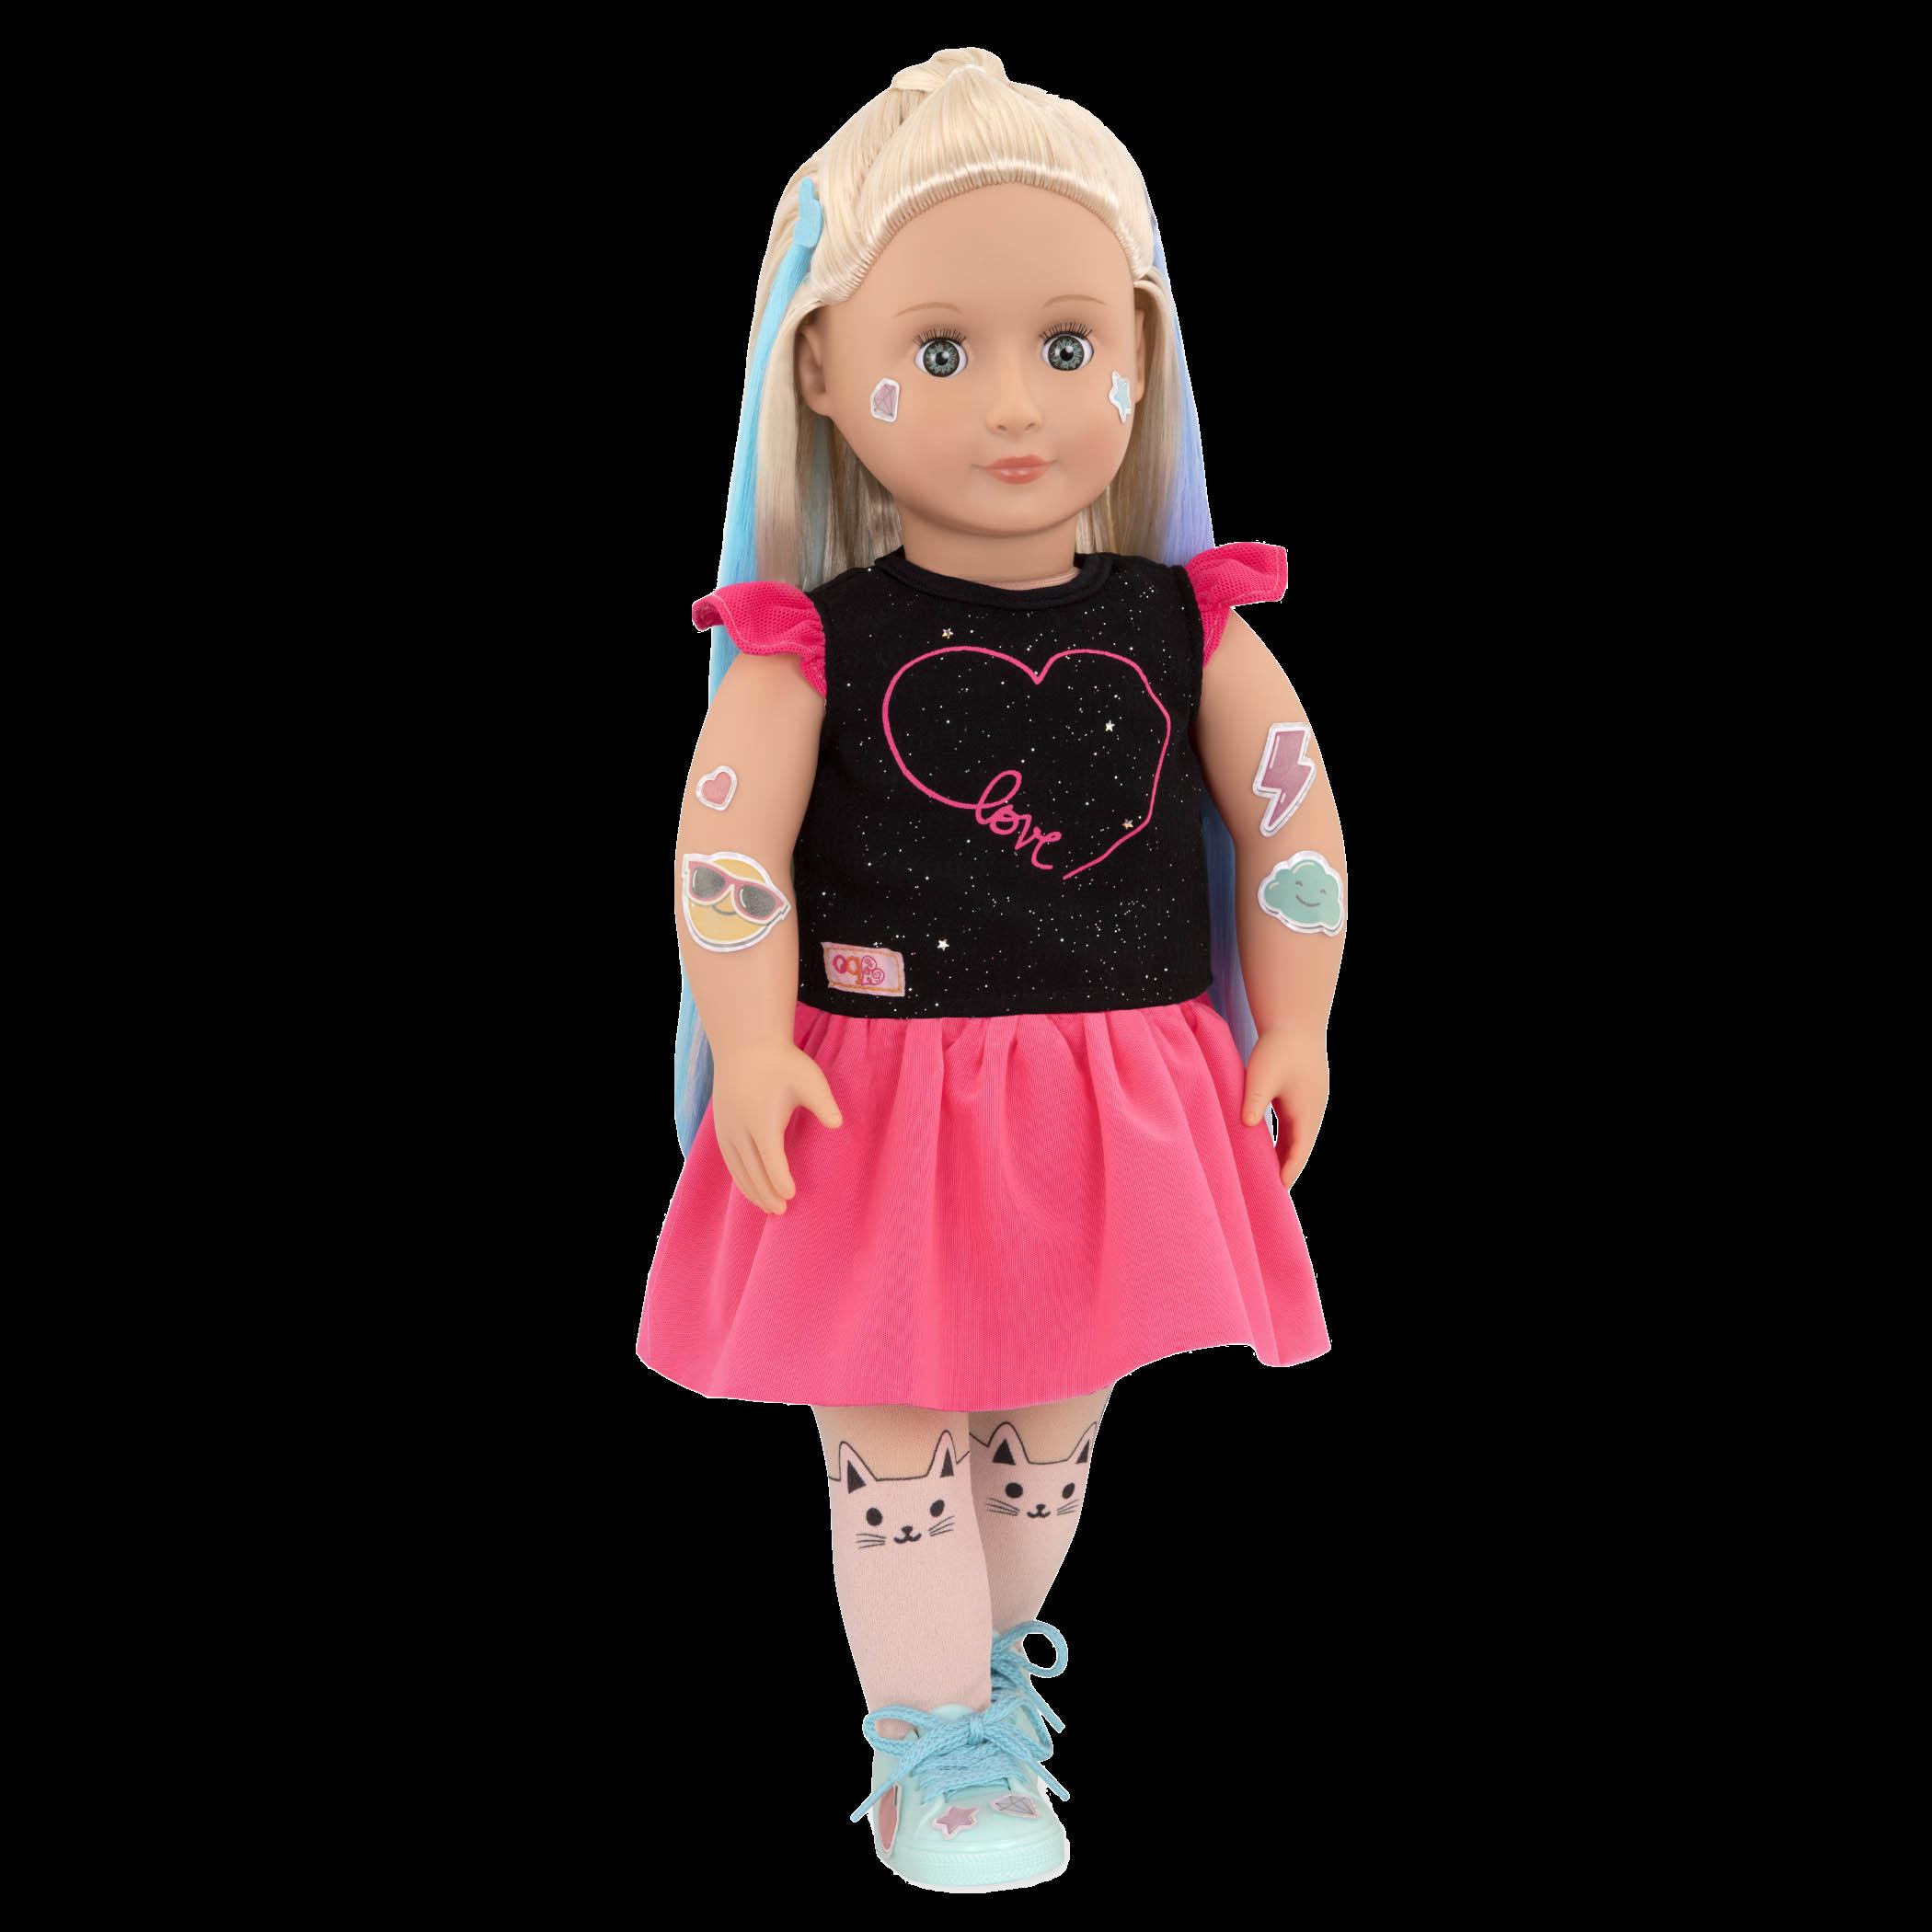 Luana wearing pink and black dress